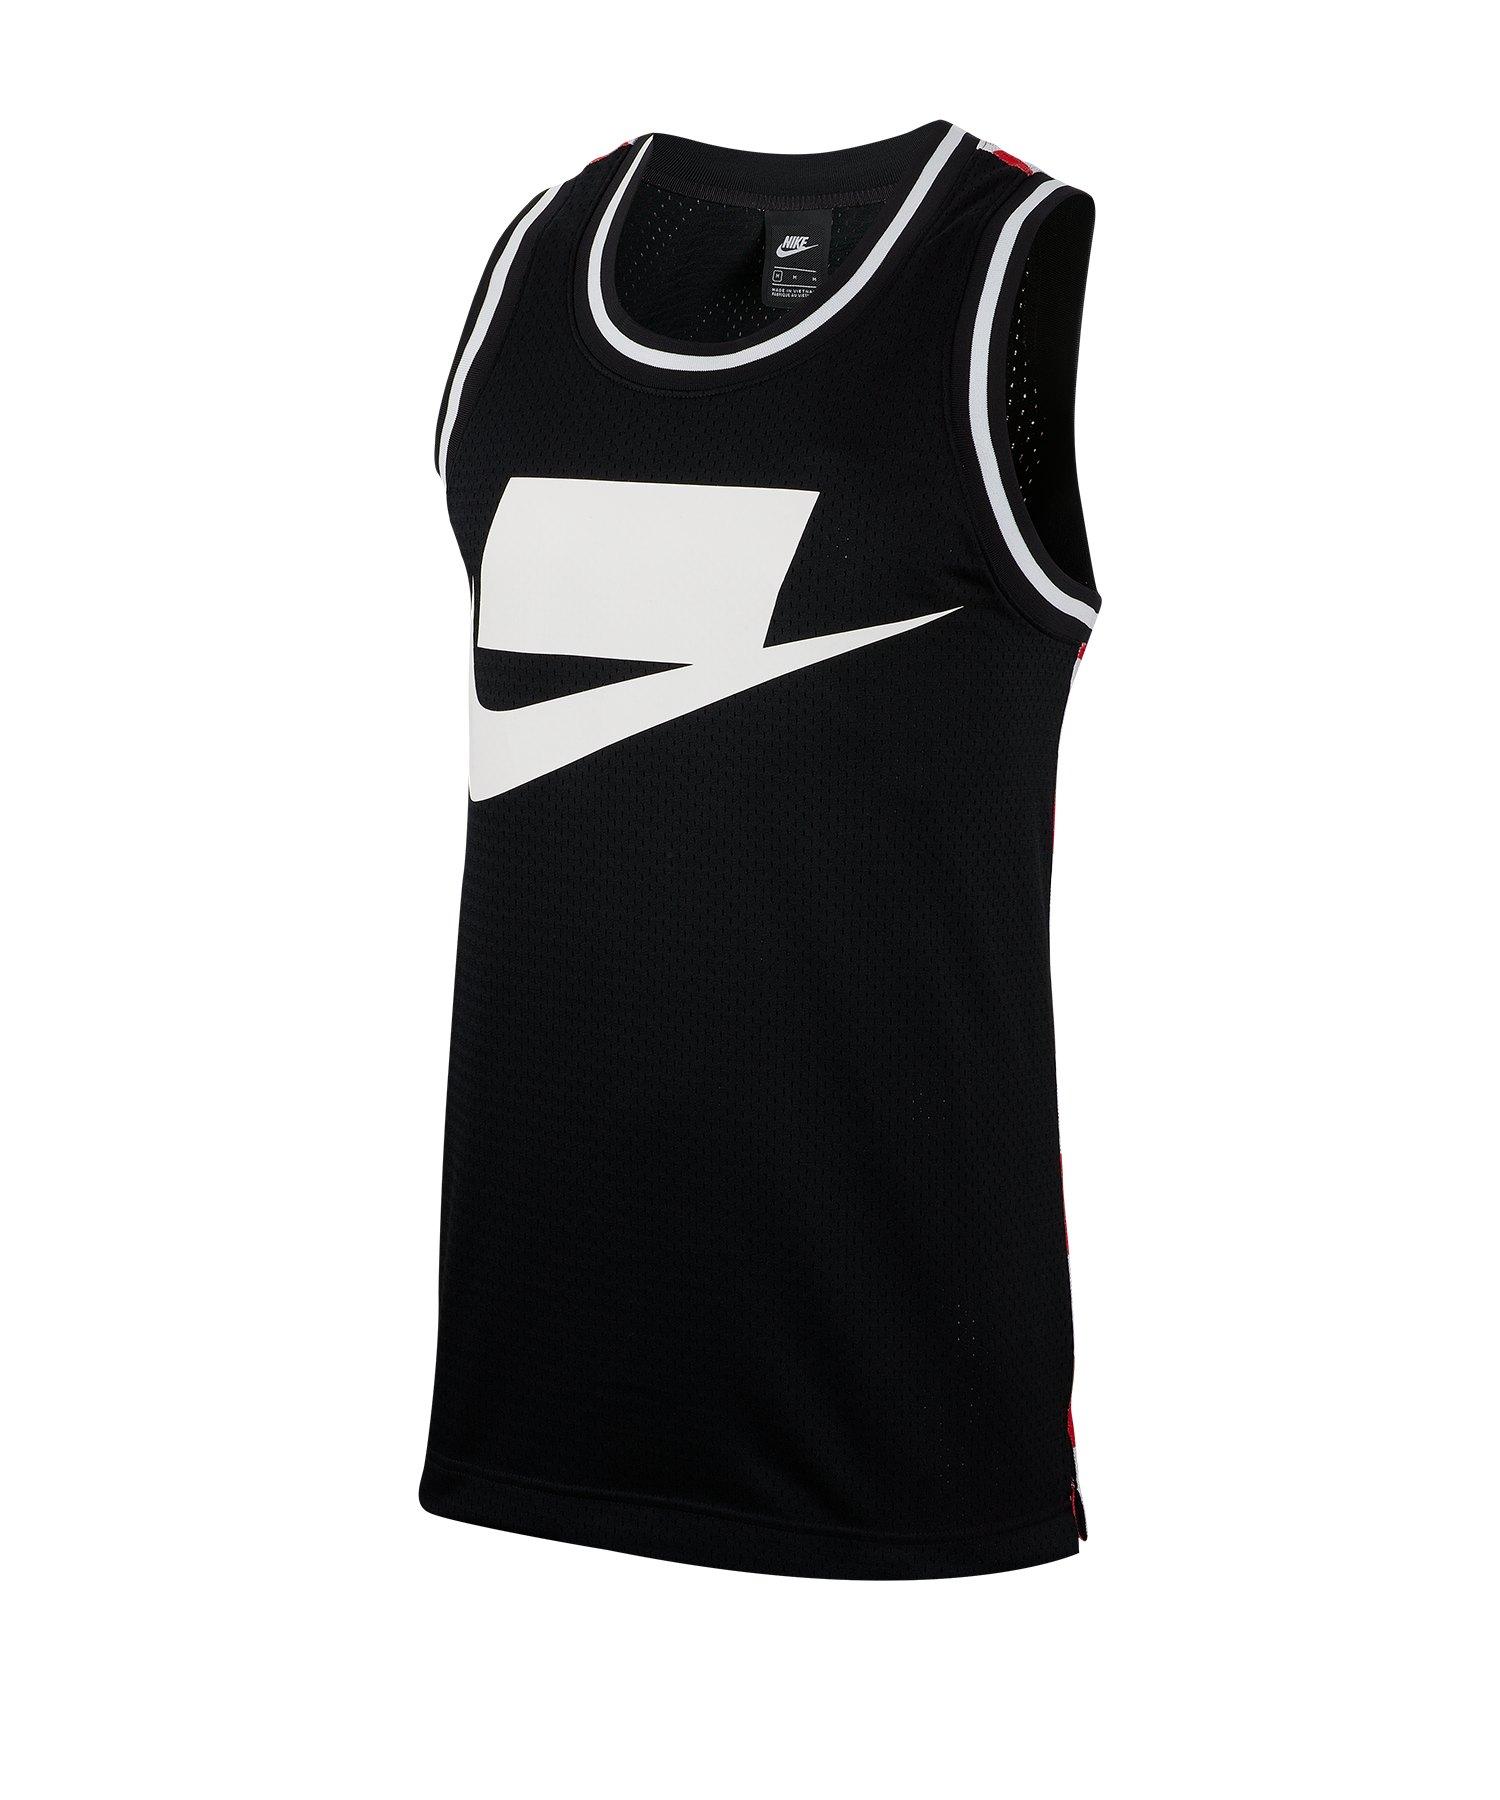 Nike Check AOP Tank Top Schwarz Running Weiss F010 - Schwarz